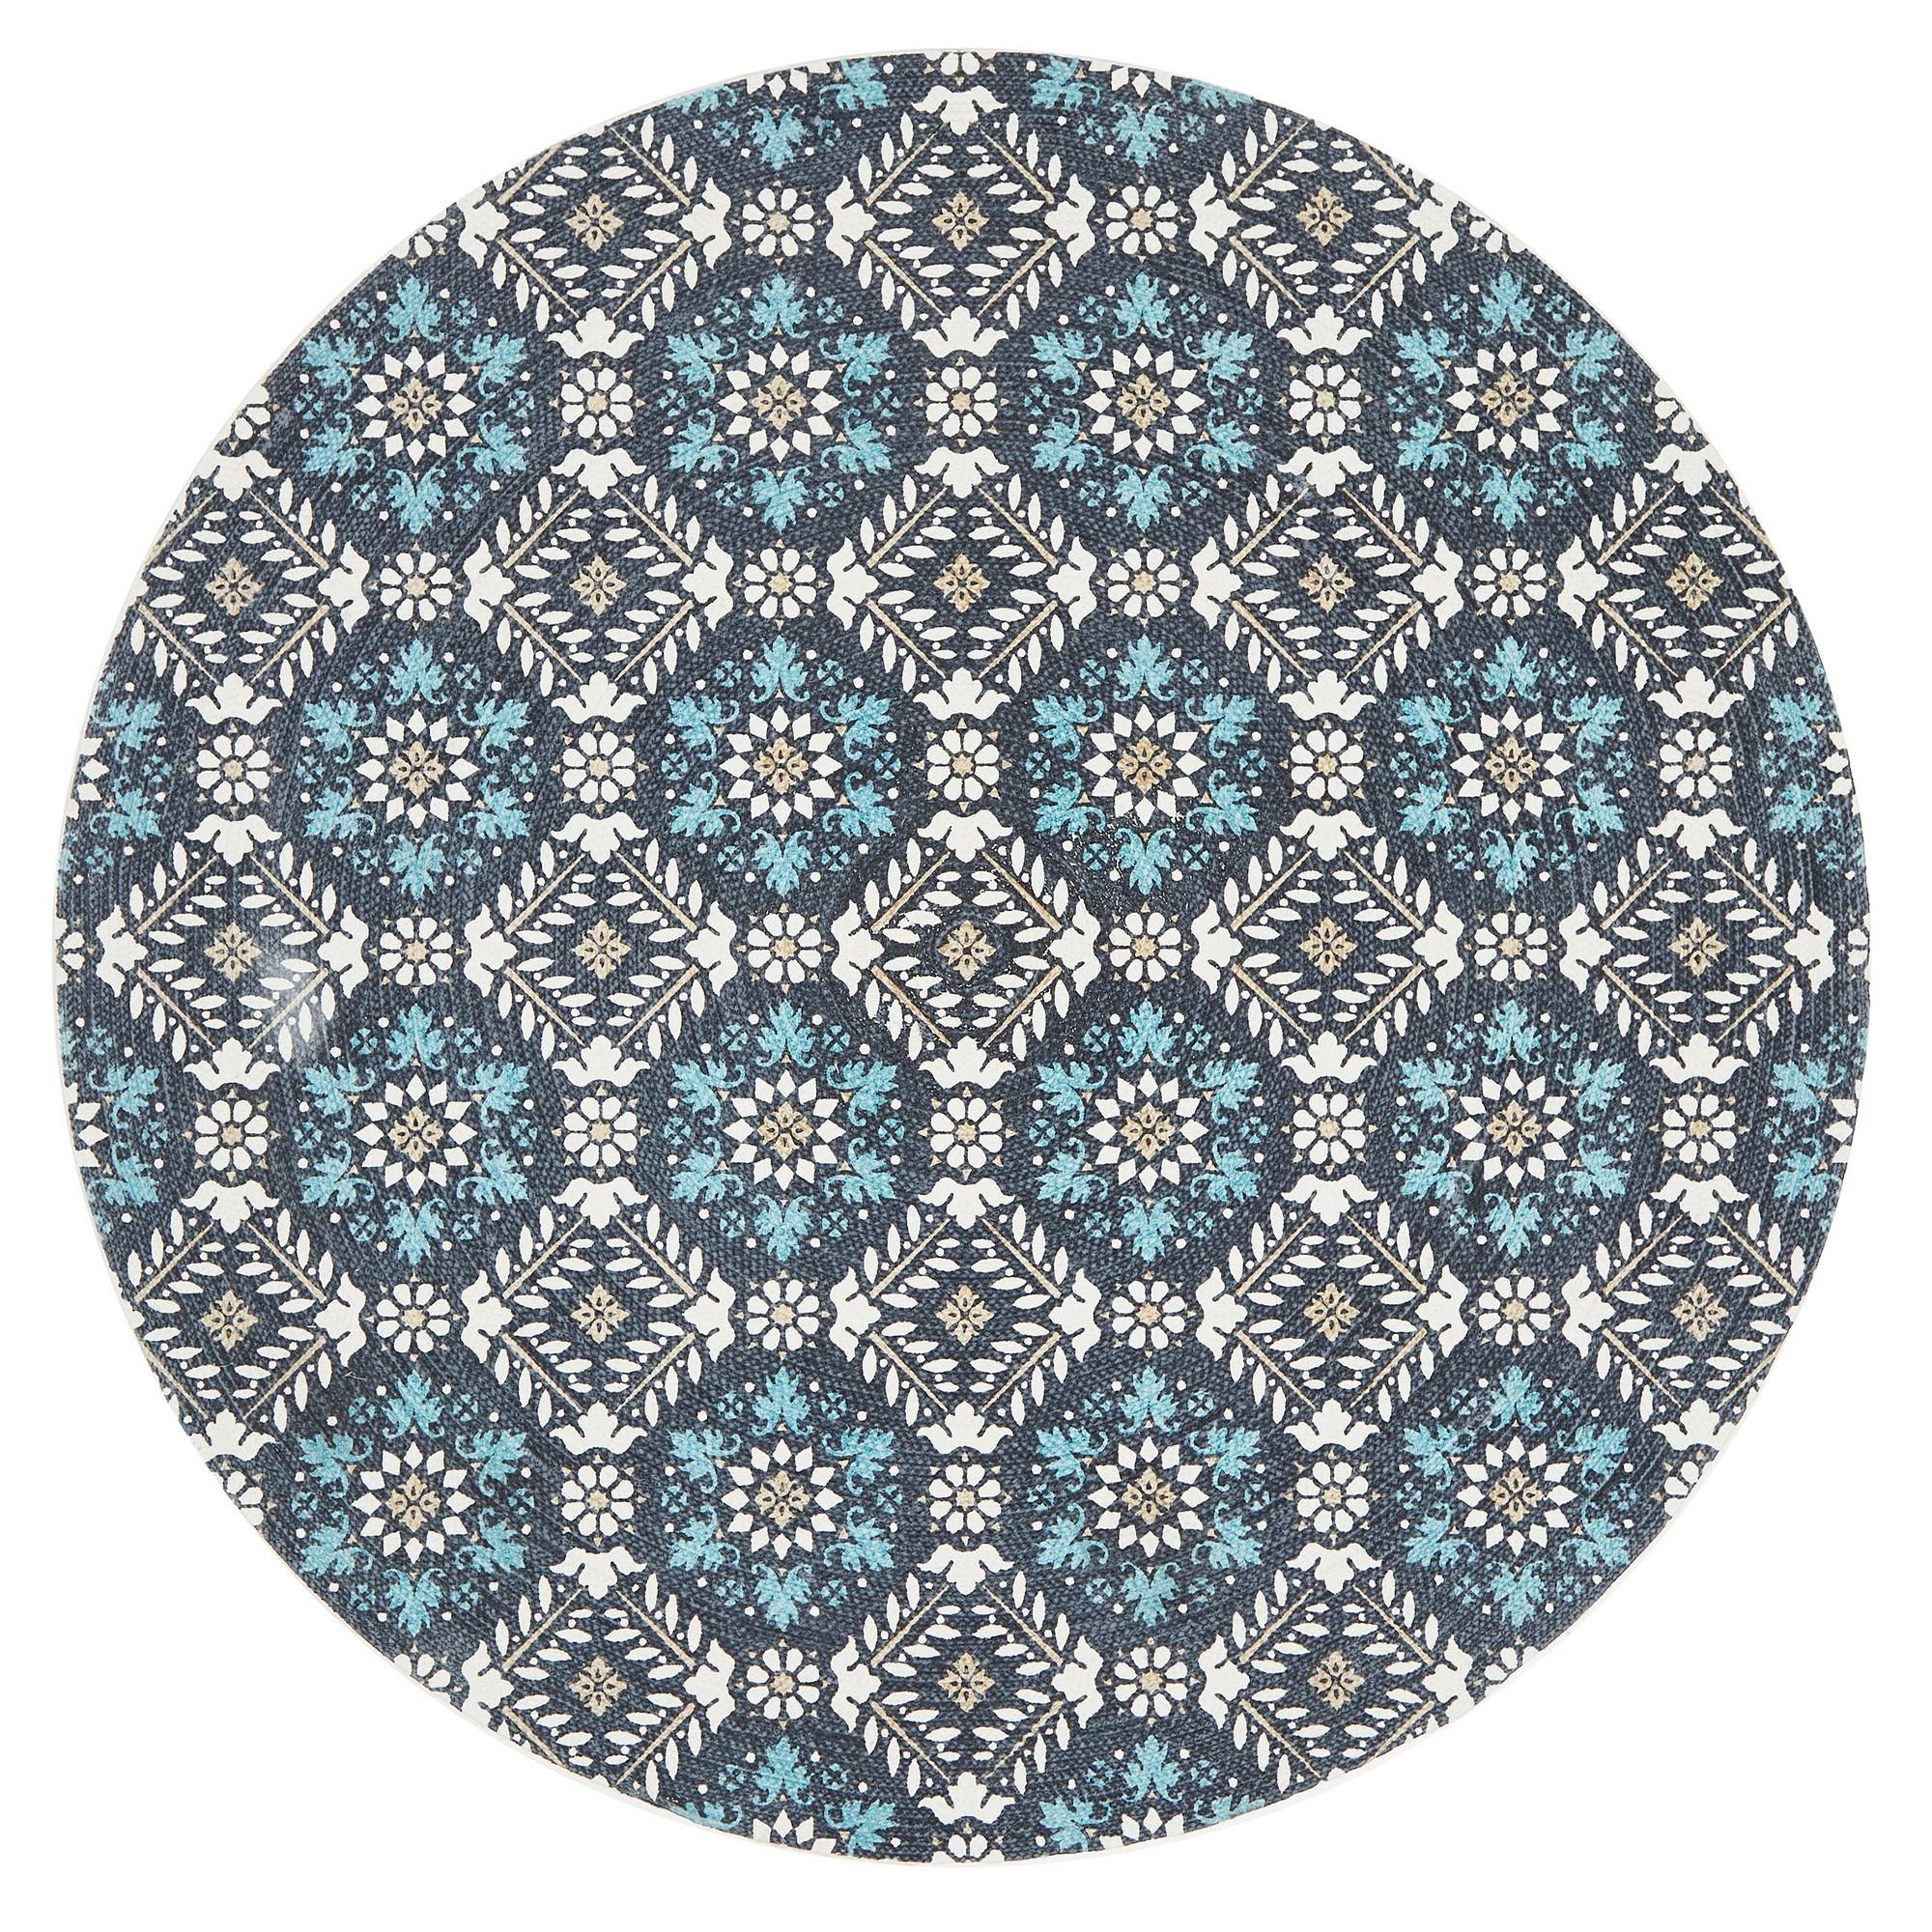 Lunar Eugenie Printed Cotton Round Rug, 120cm